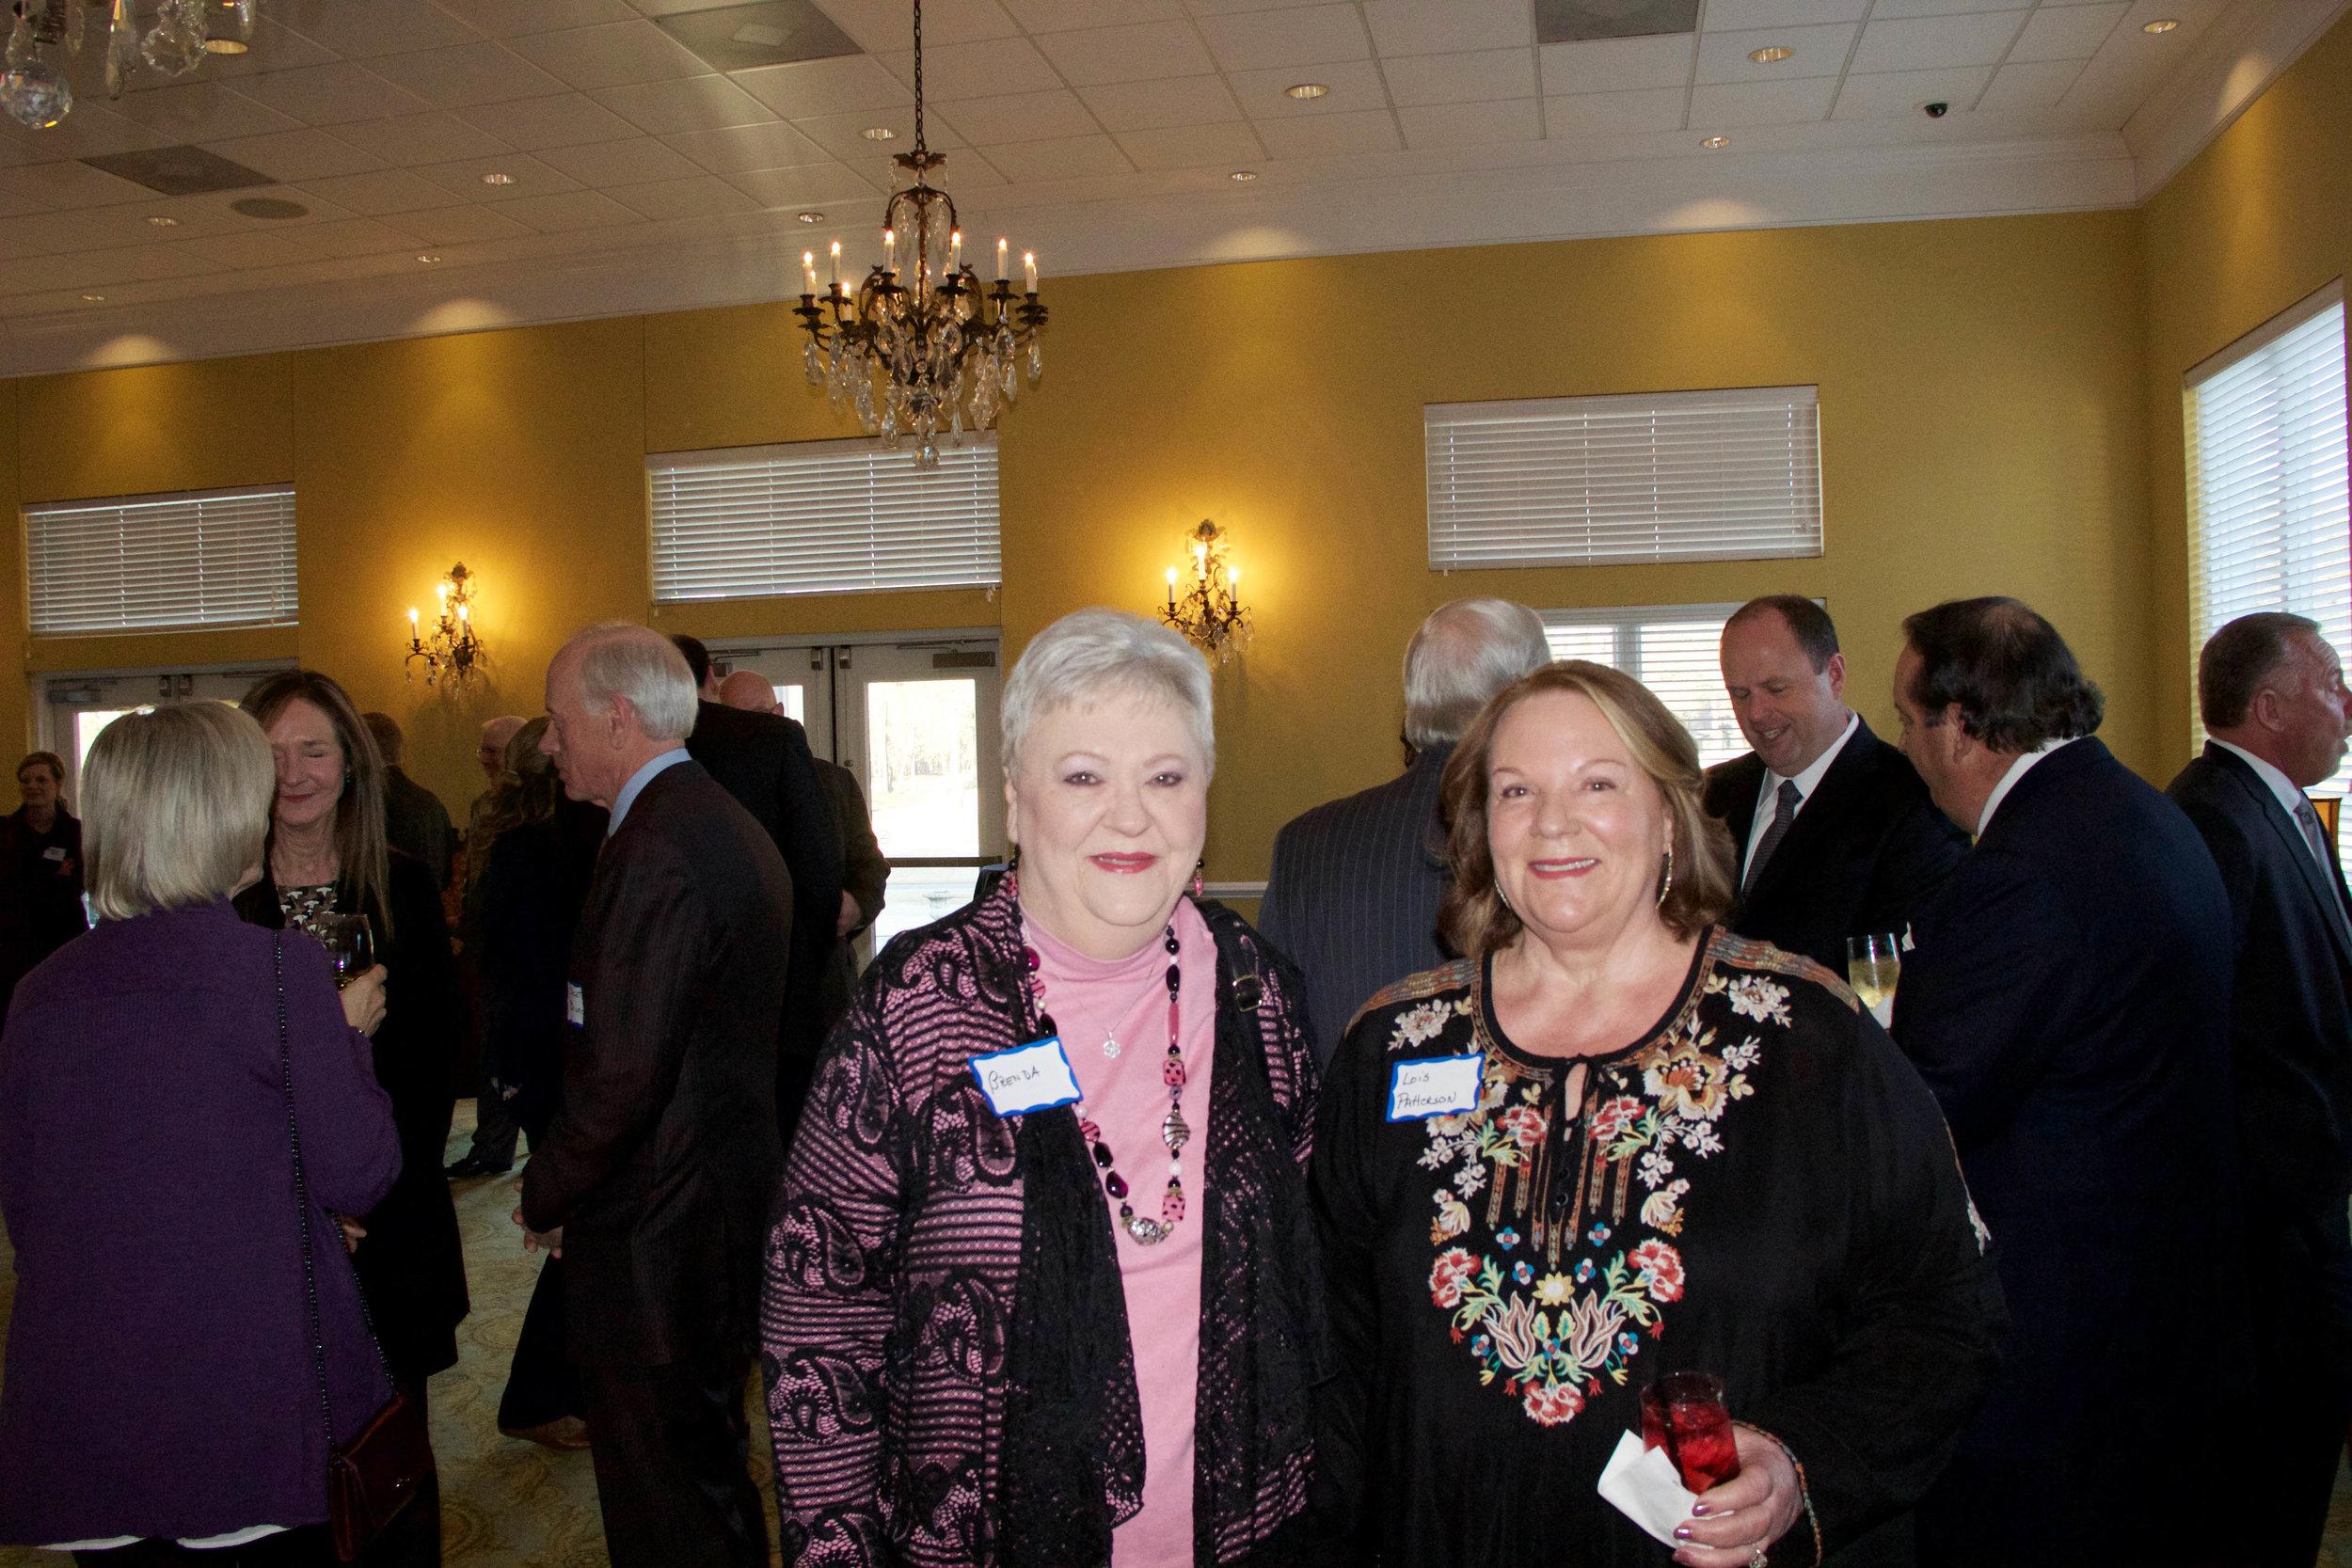 Brenda Milton and Lois Patterson